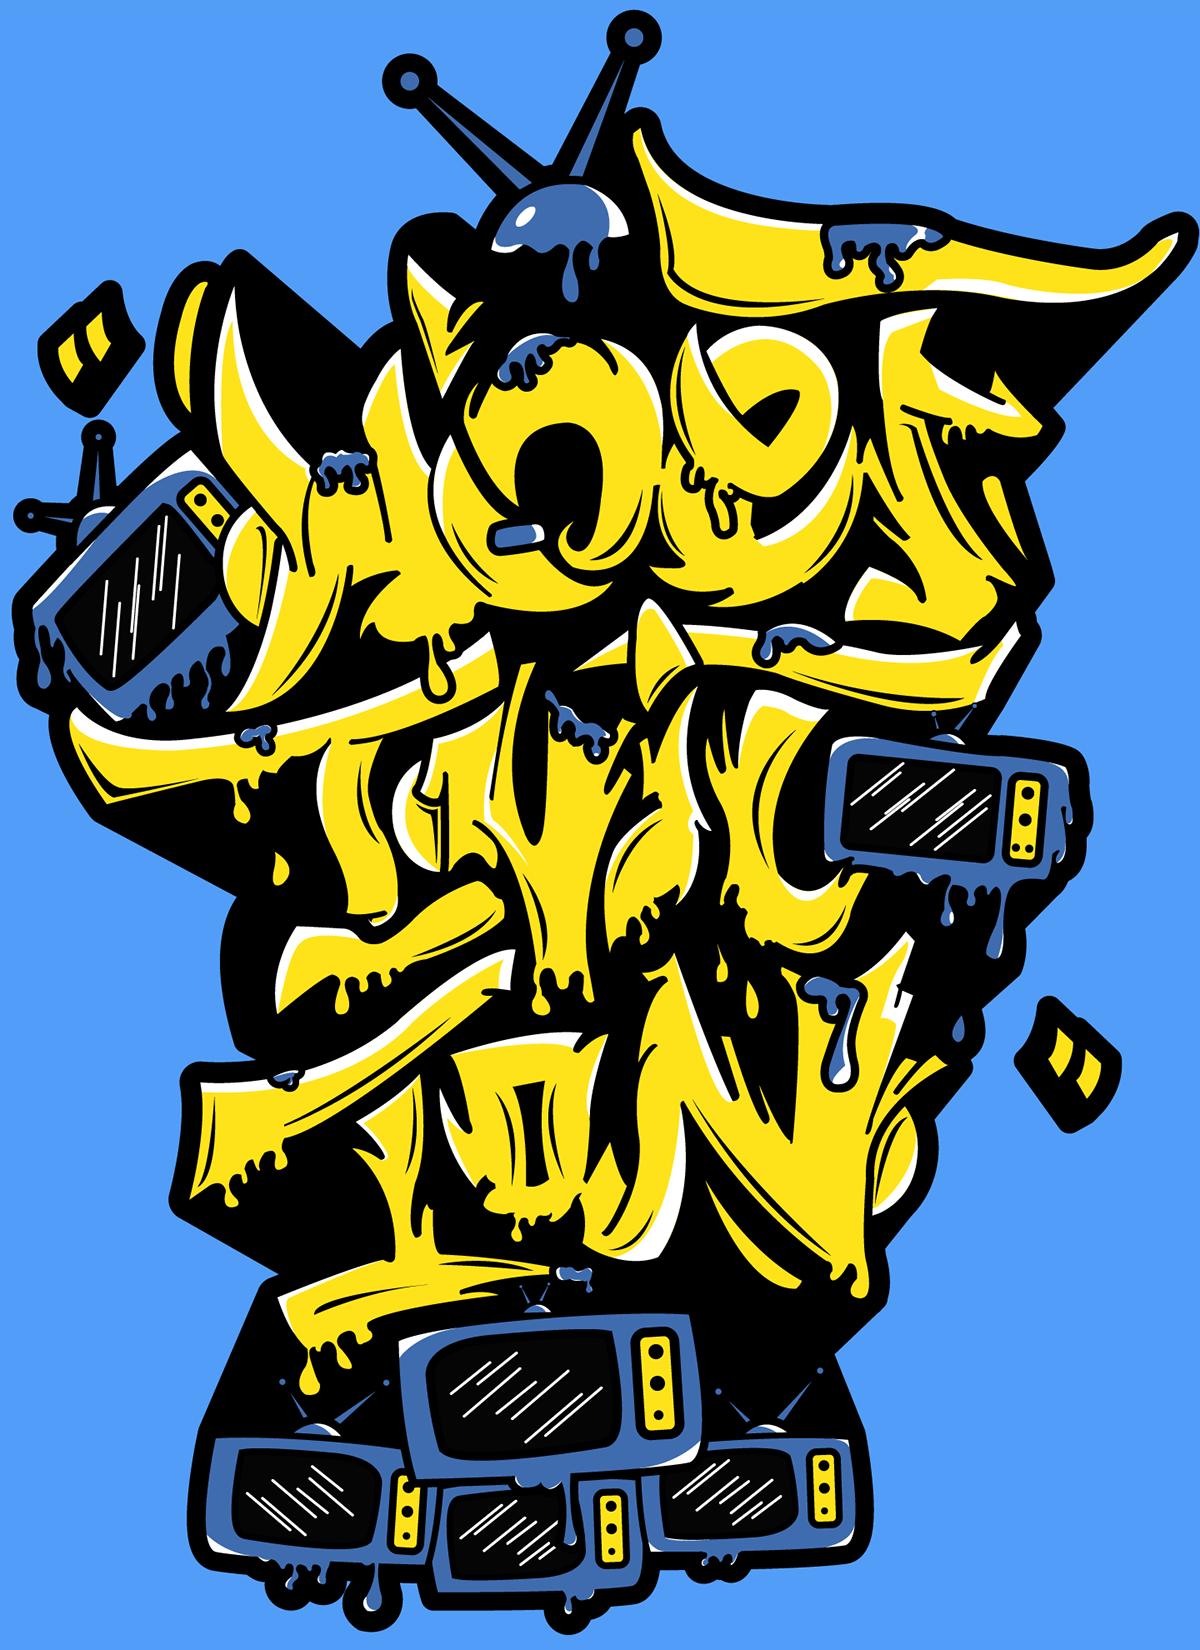 Hi Definition Digital Graffiti 1 On Behance